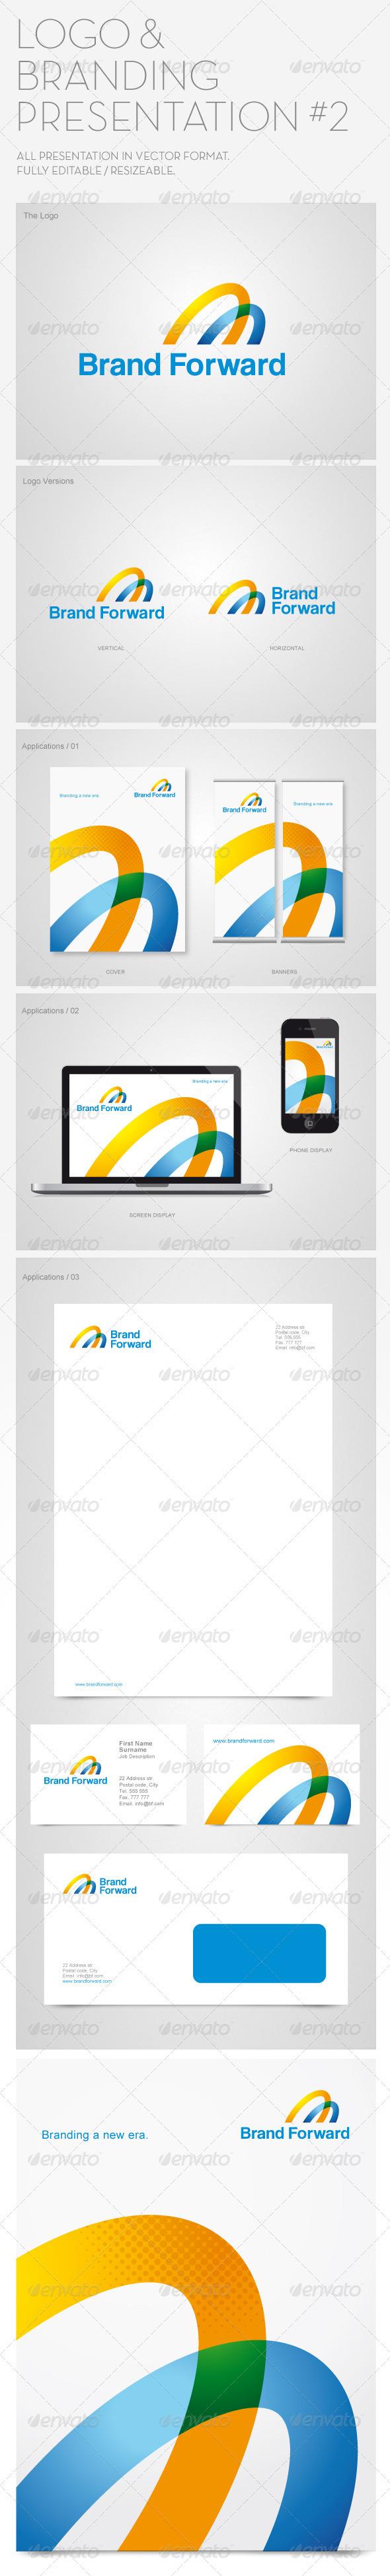 logo & branding presentation #2 #graphicriver logo template, Powerpoint templates